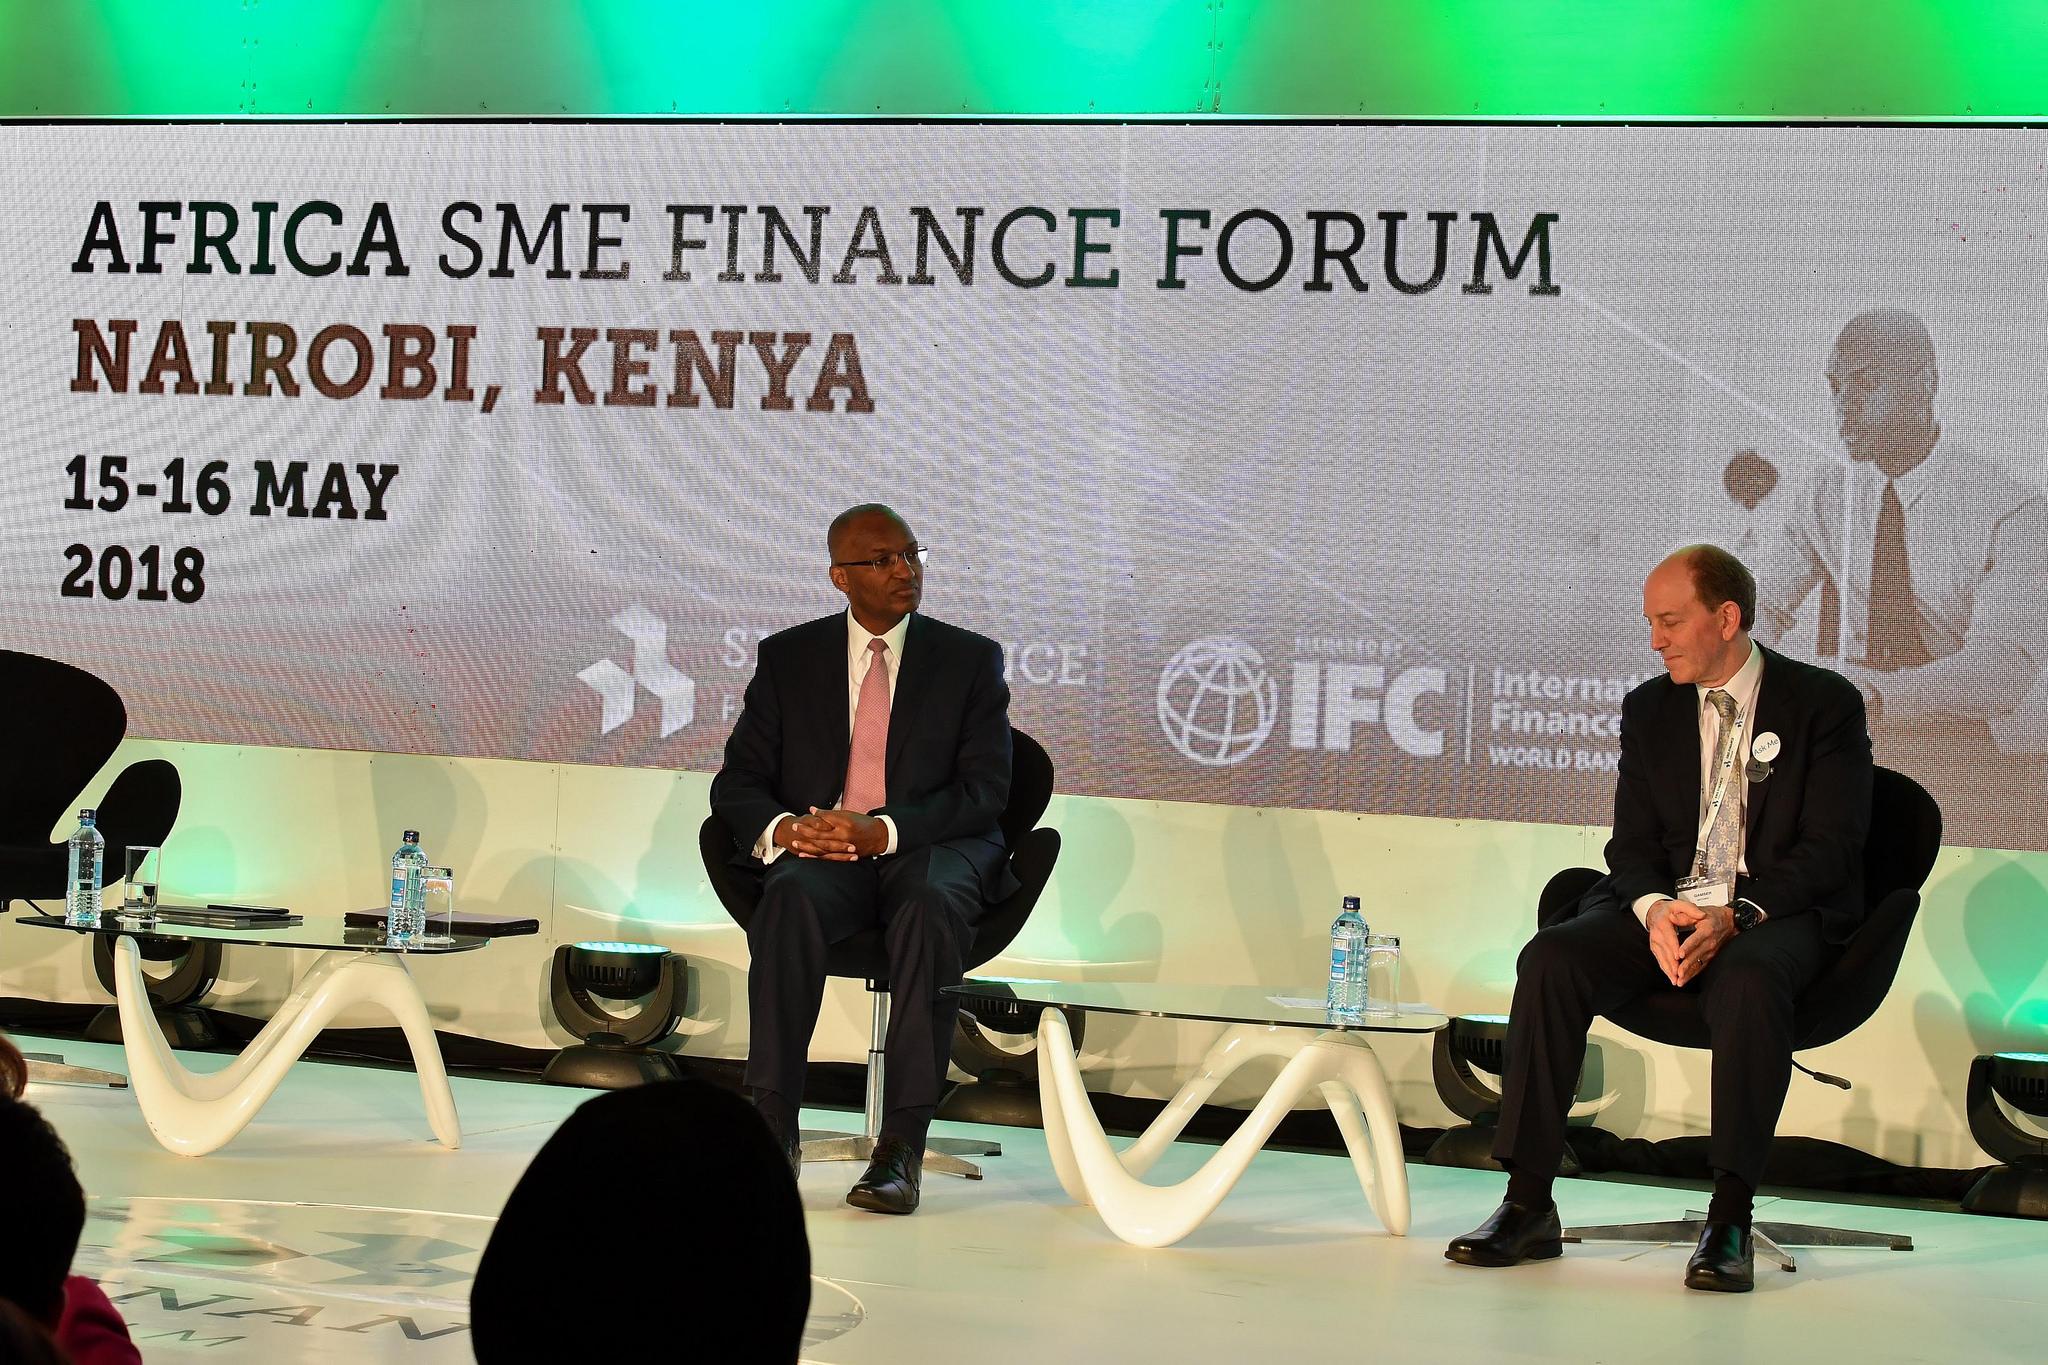 Africa SME Finance Forum 2018 |